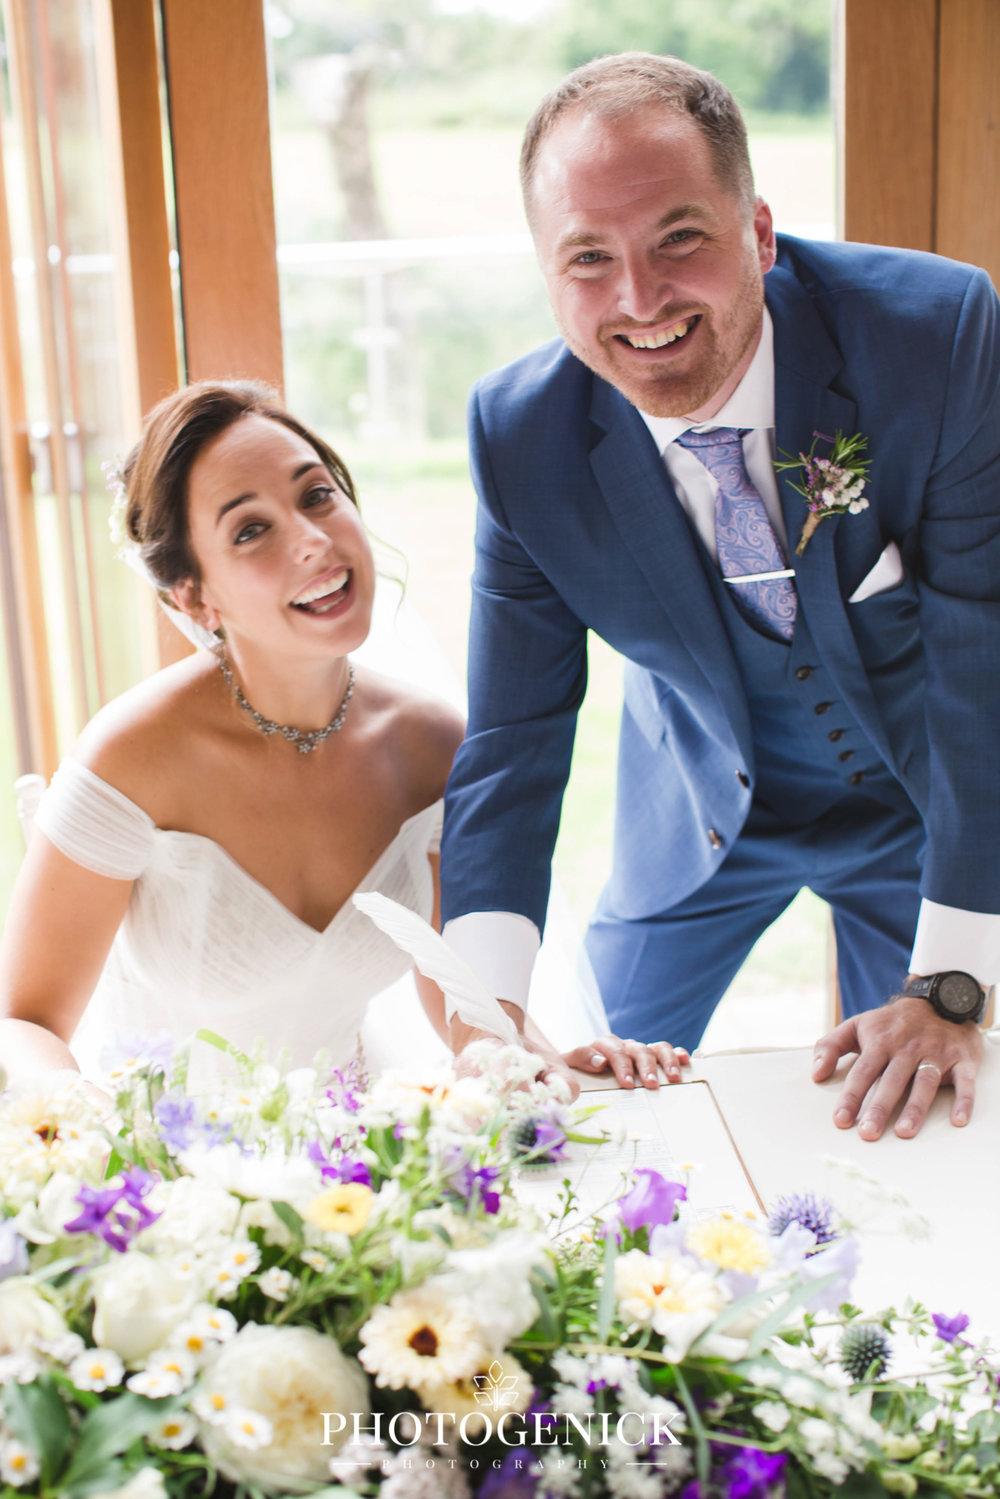 oldwalls gower wedding photographers-27.jpg